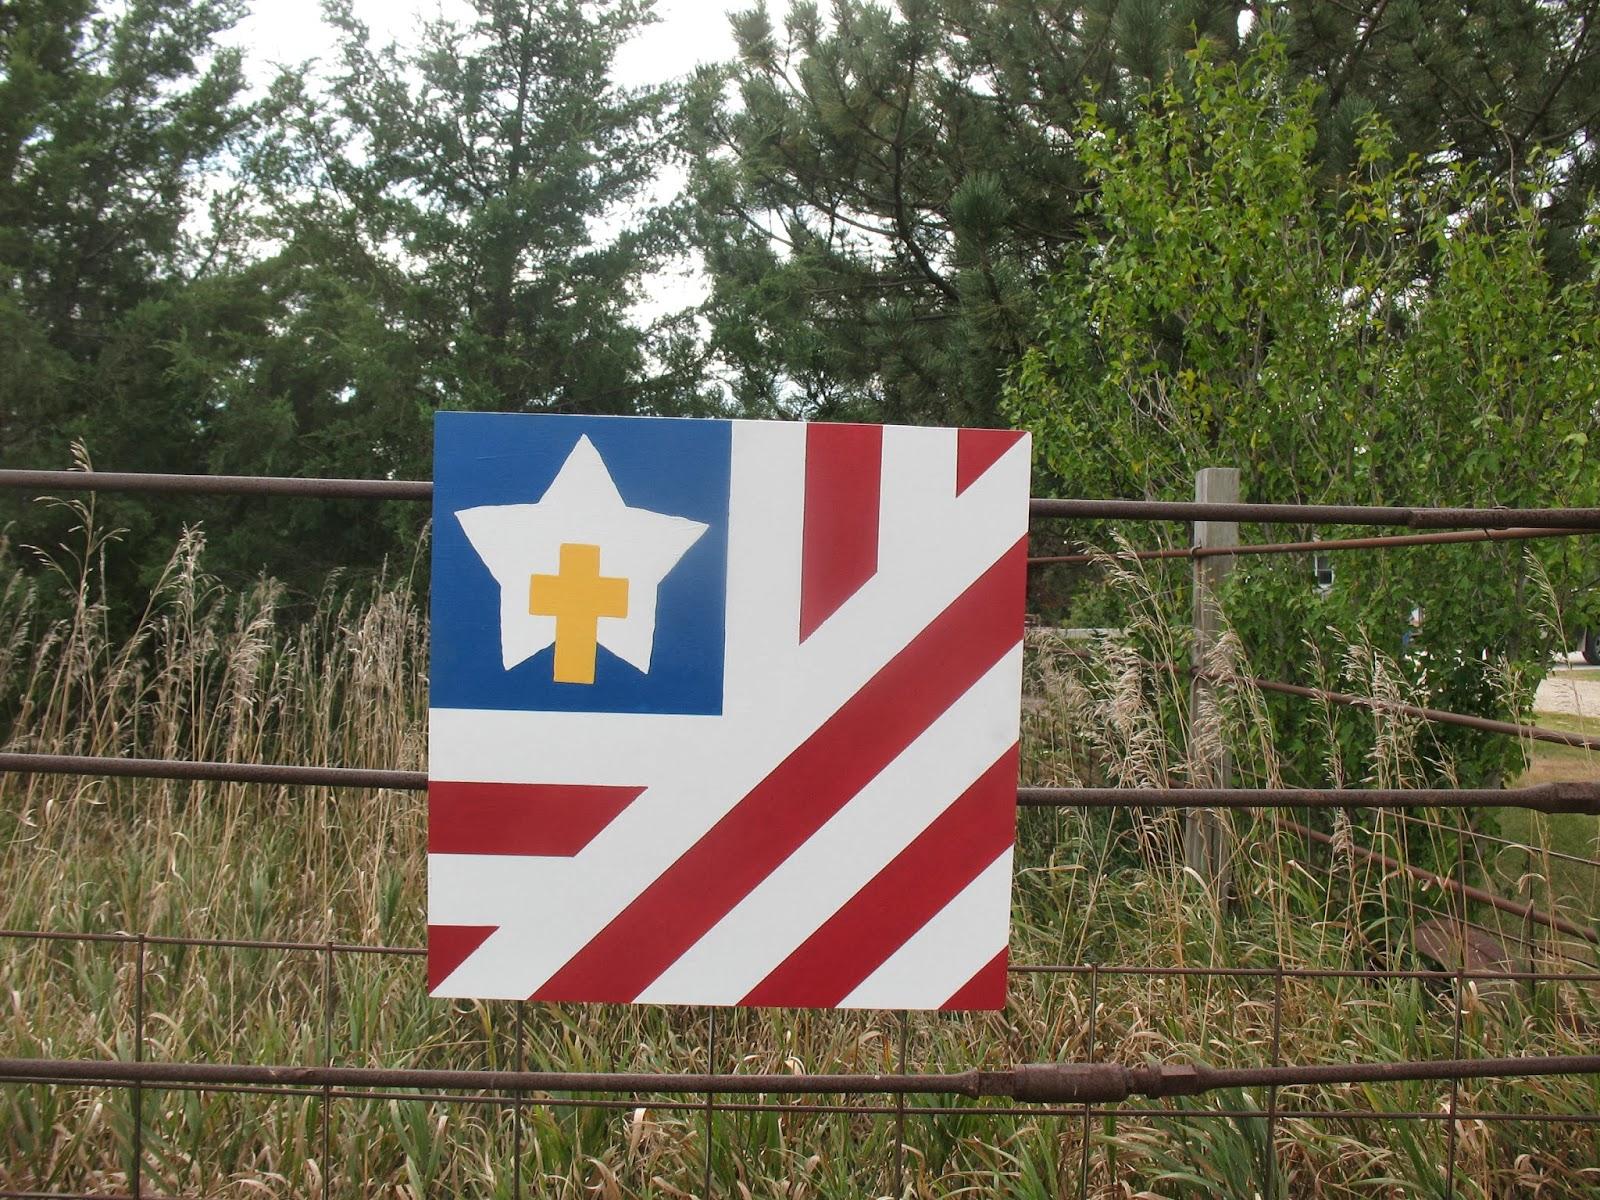 Kansas morris county dwight - Clay County